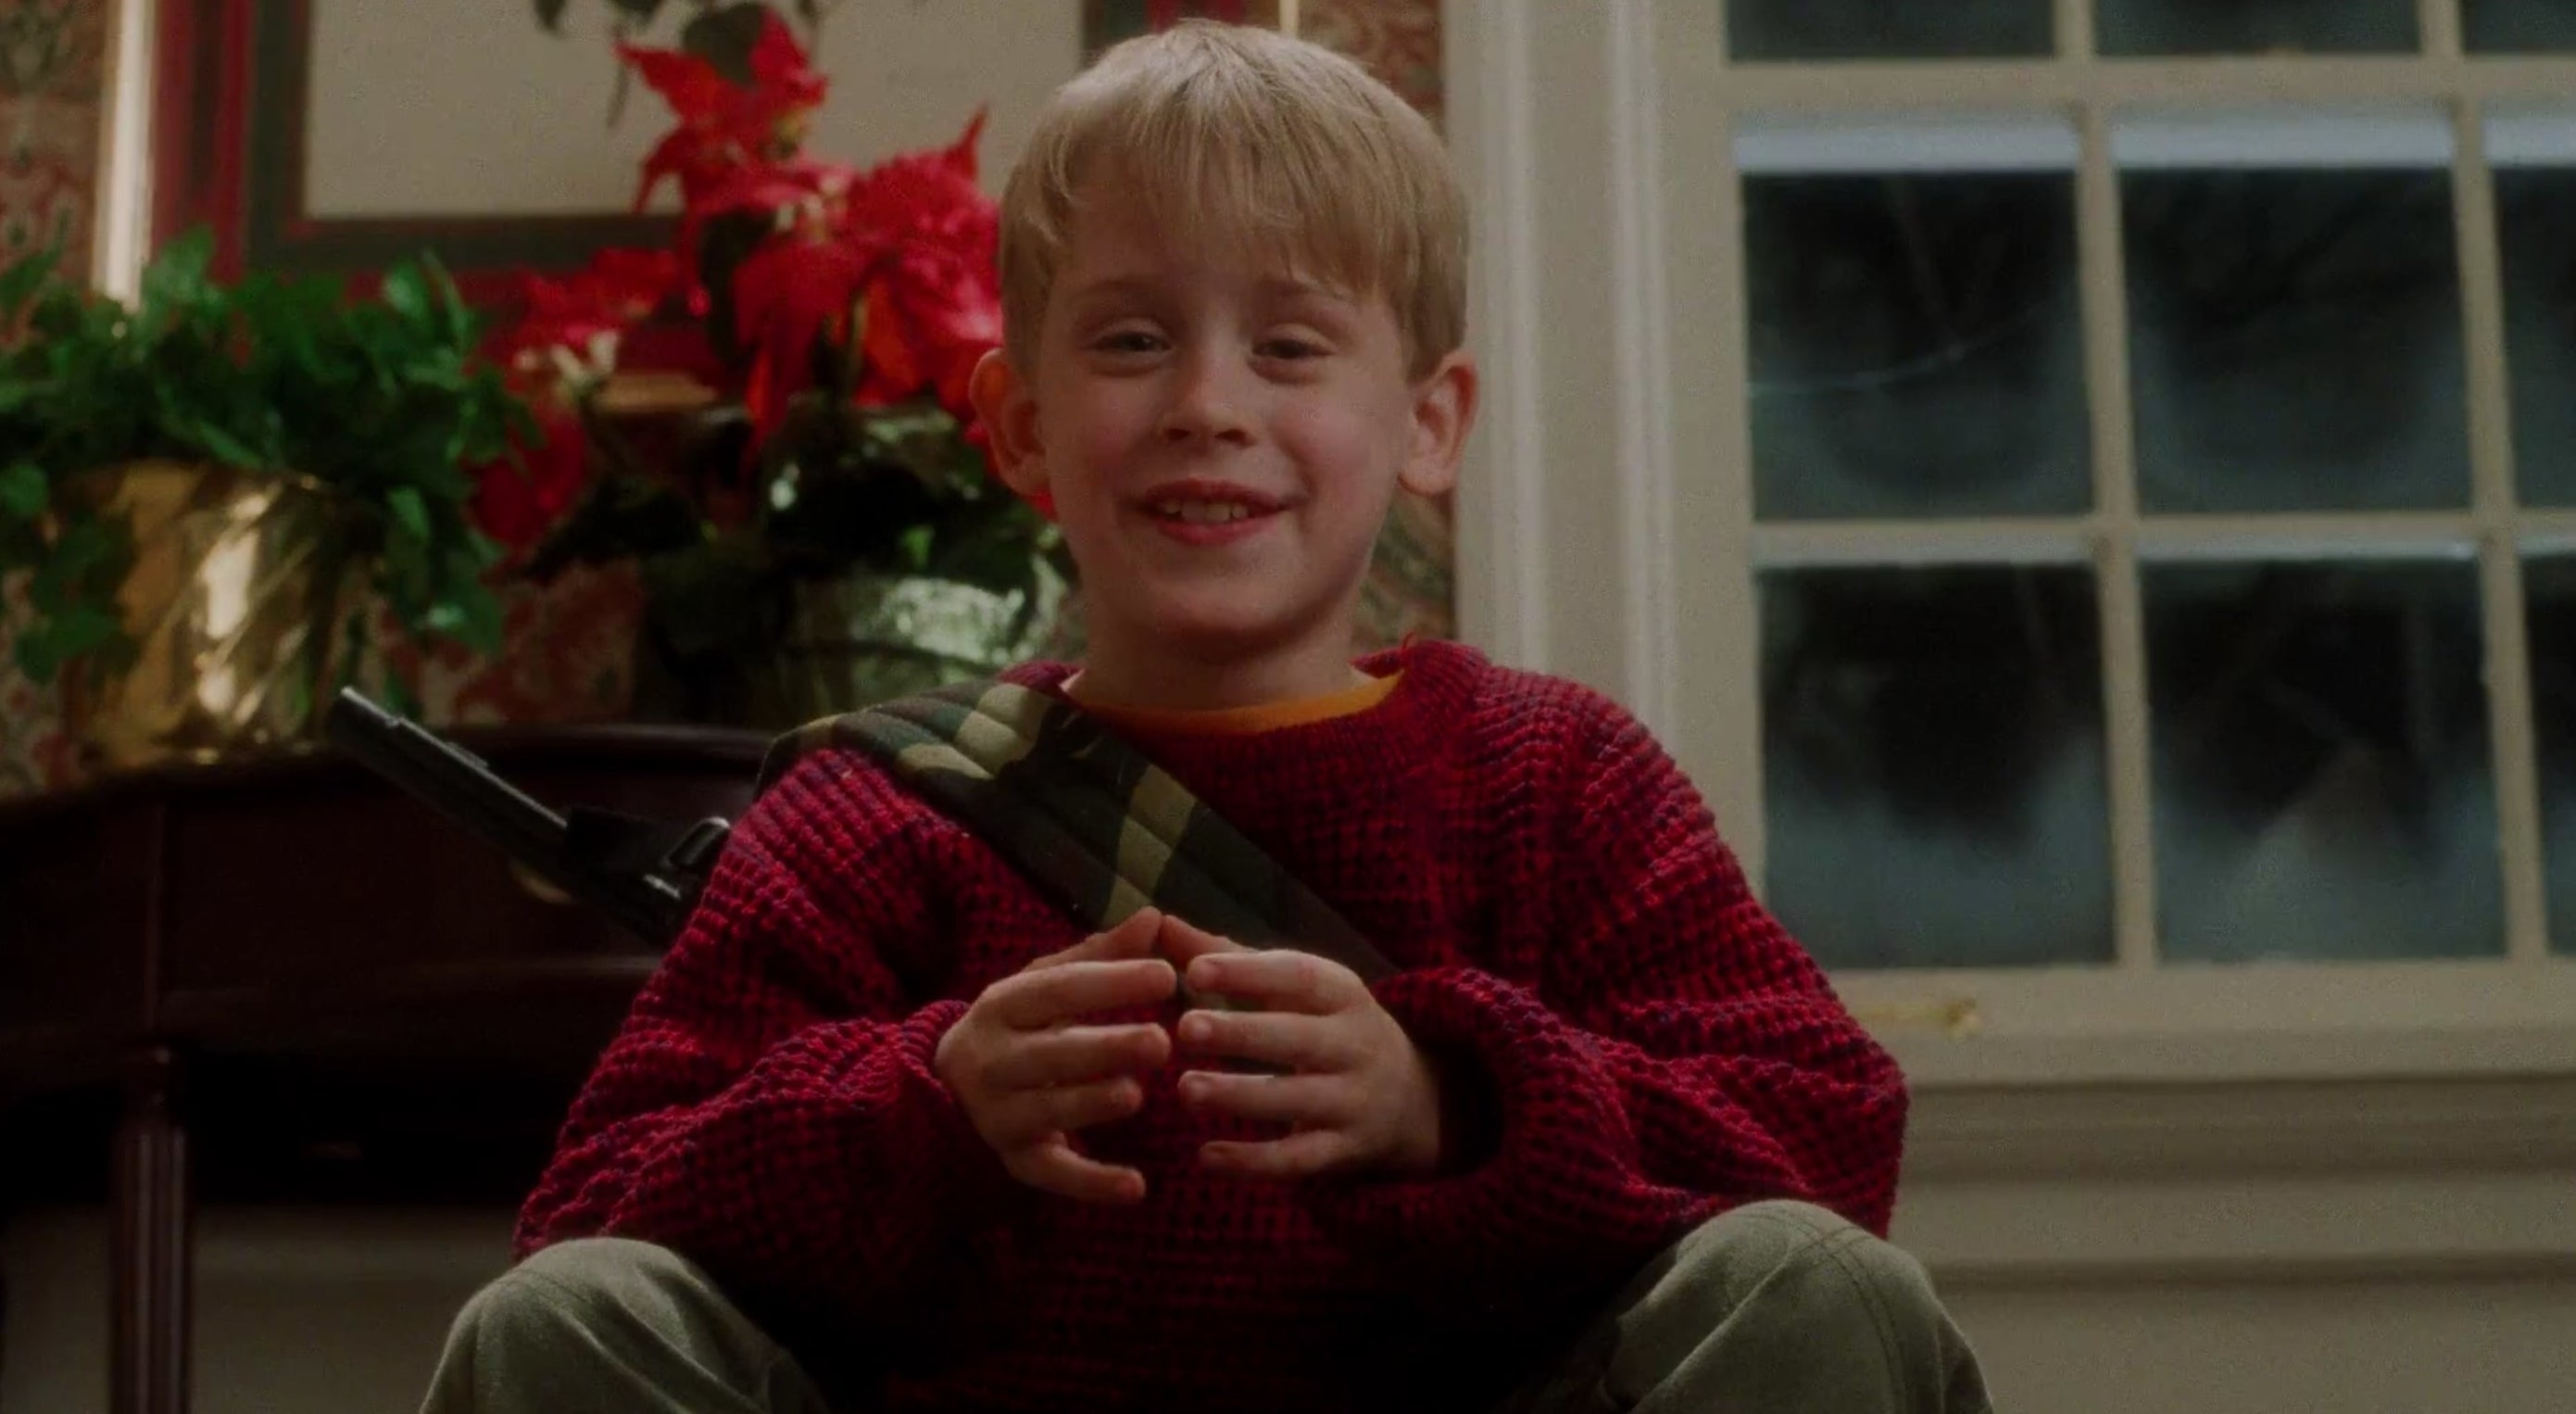 A boy in a red sweater